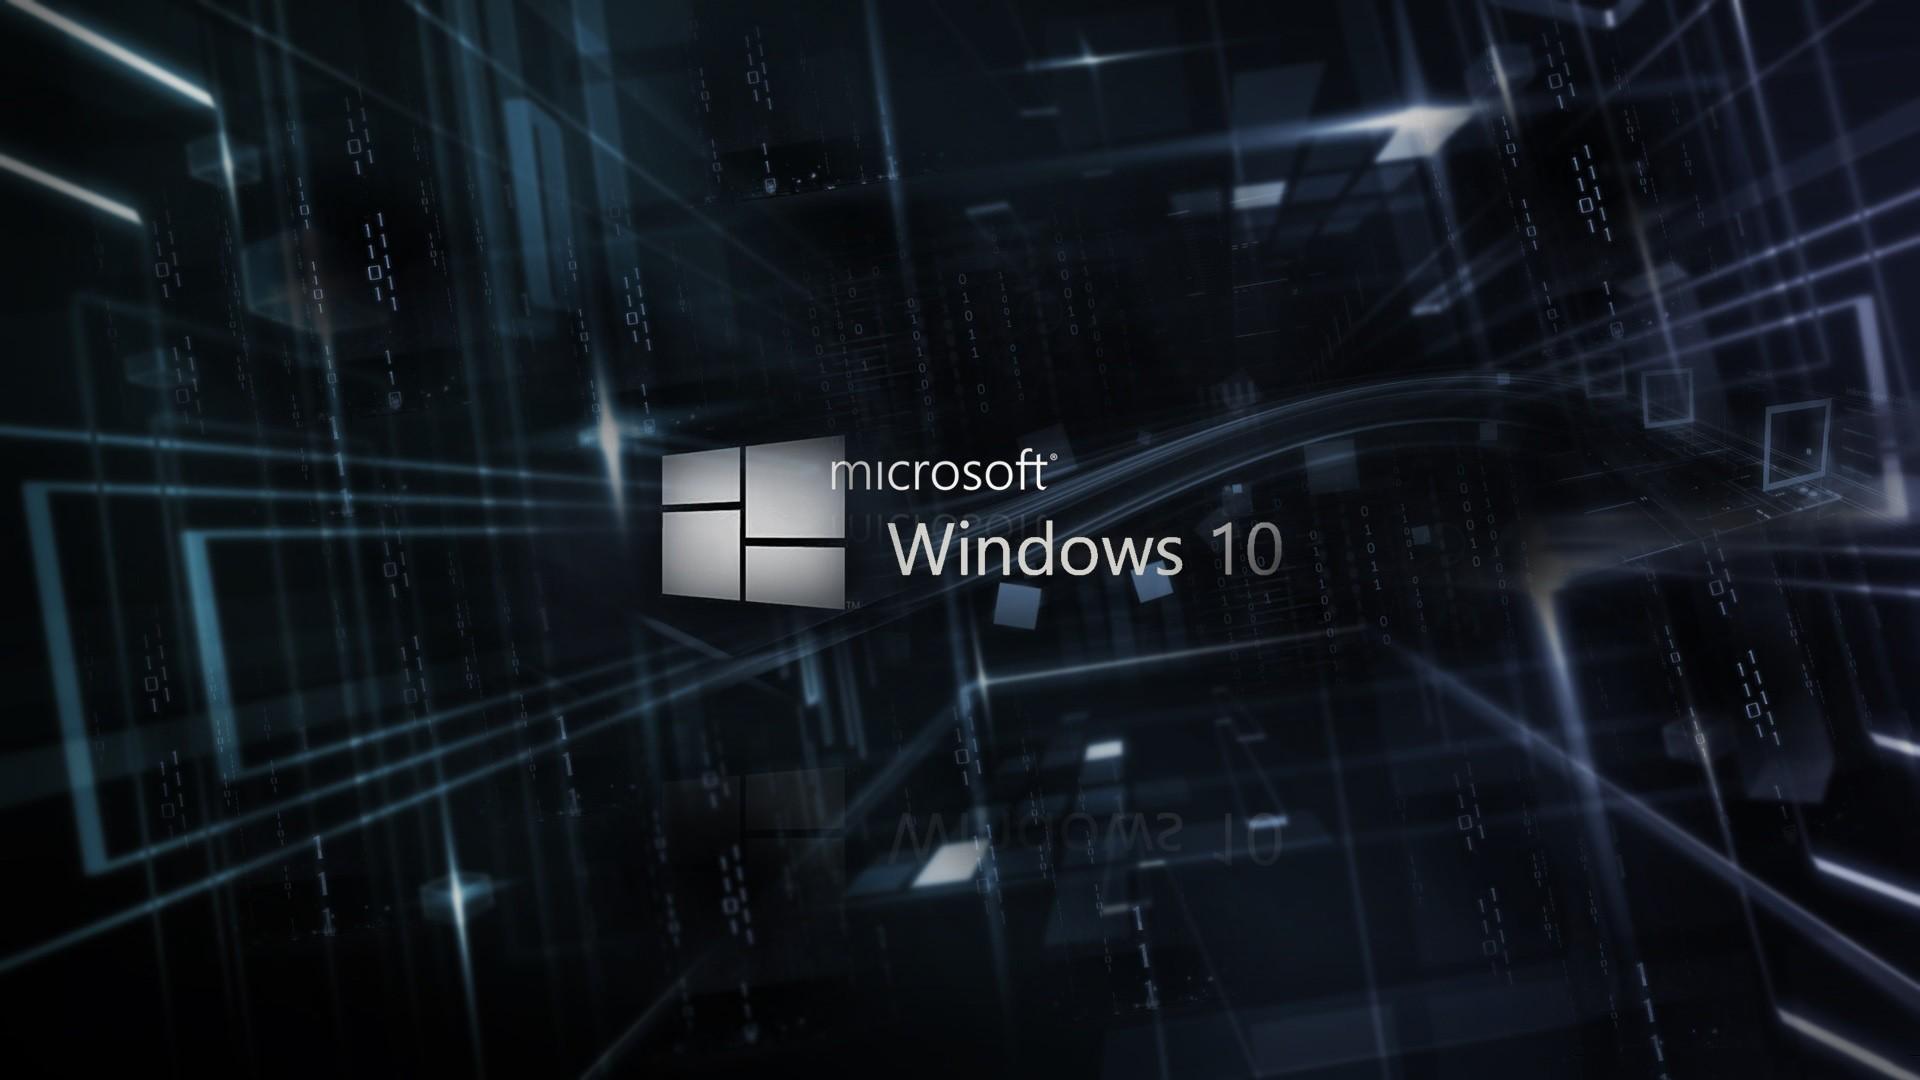 1920x1080 windows 10 desktop wallpaper 49909